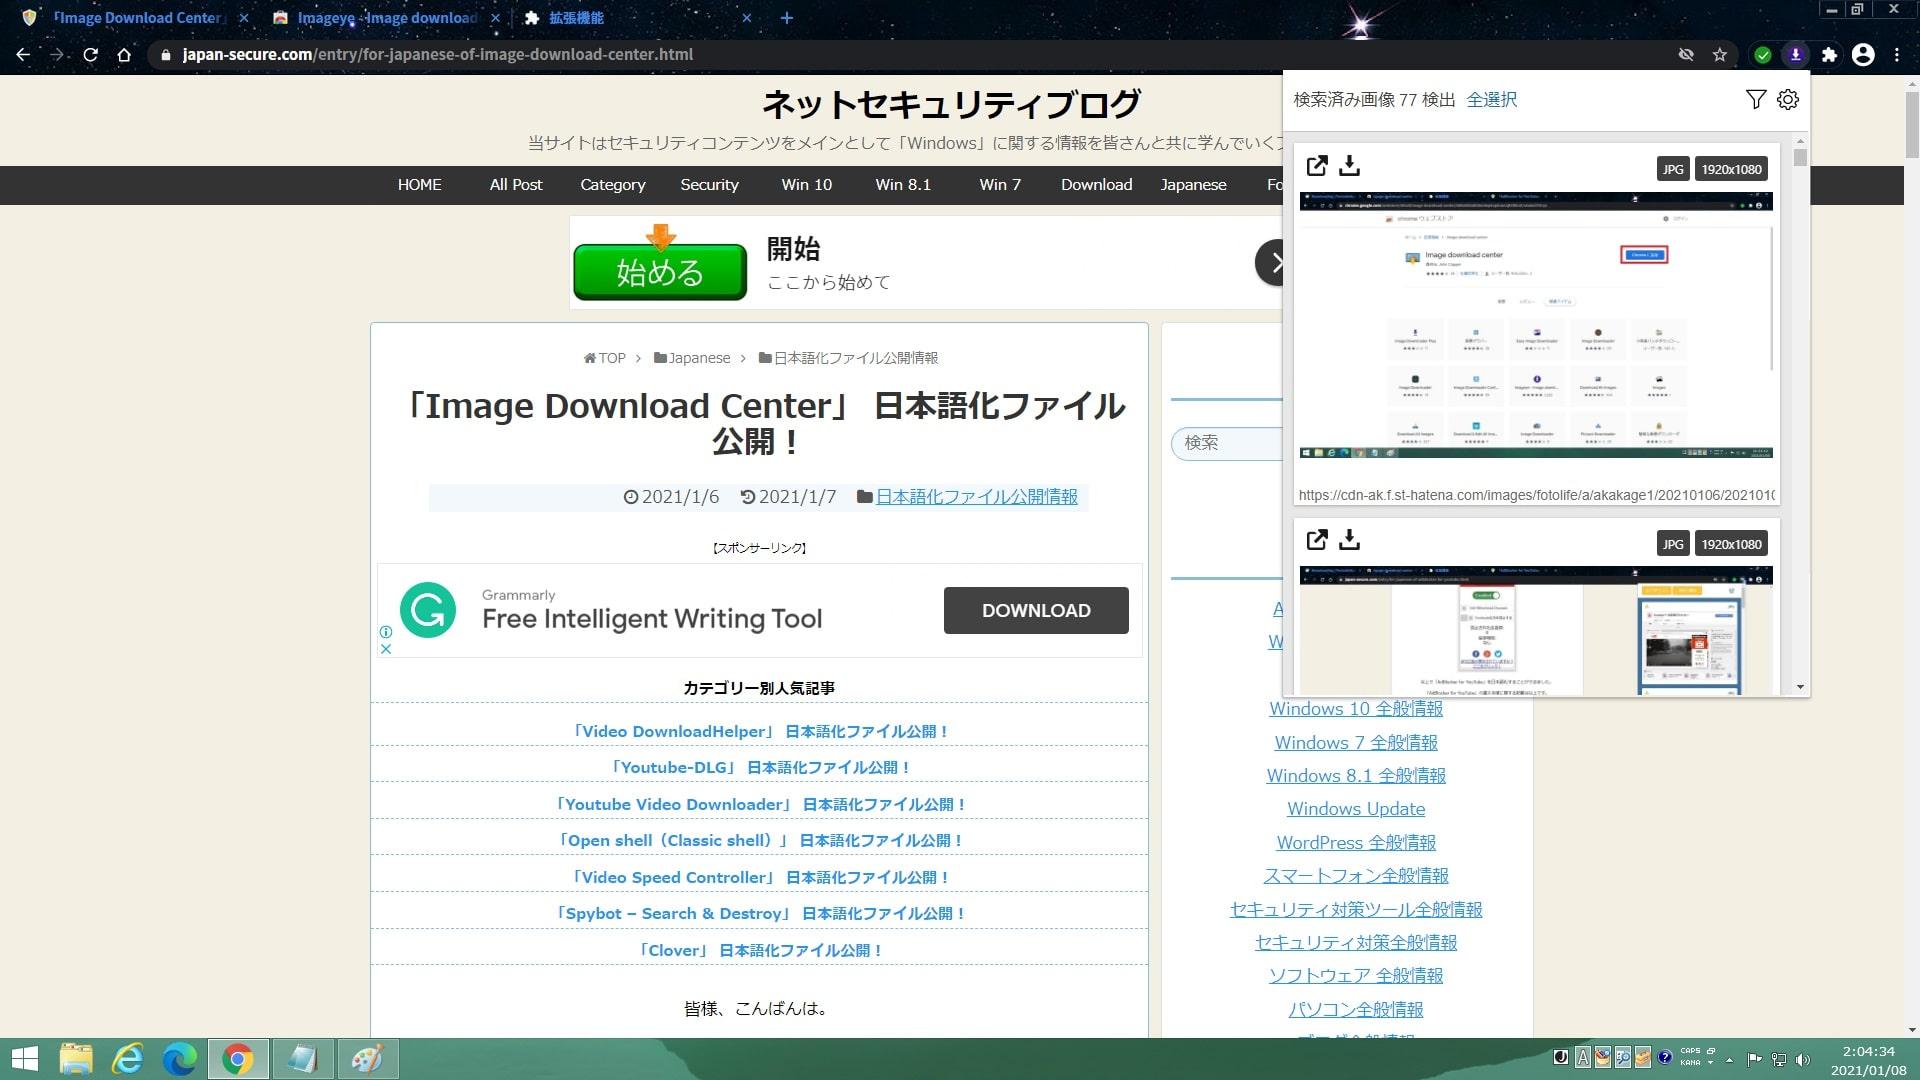 「Imageye - Image downloader」を使用して画像をダウンロードする画面